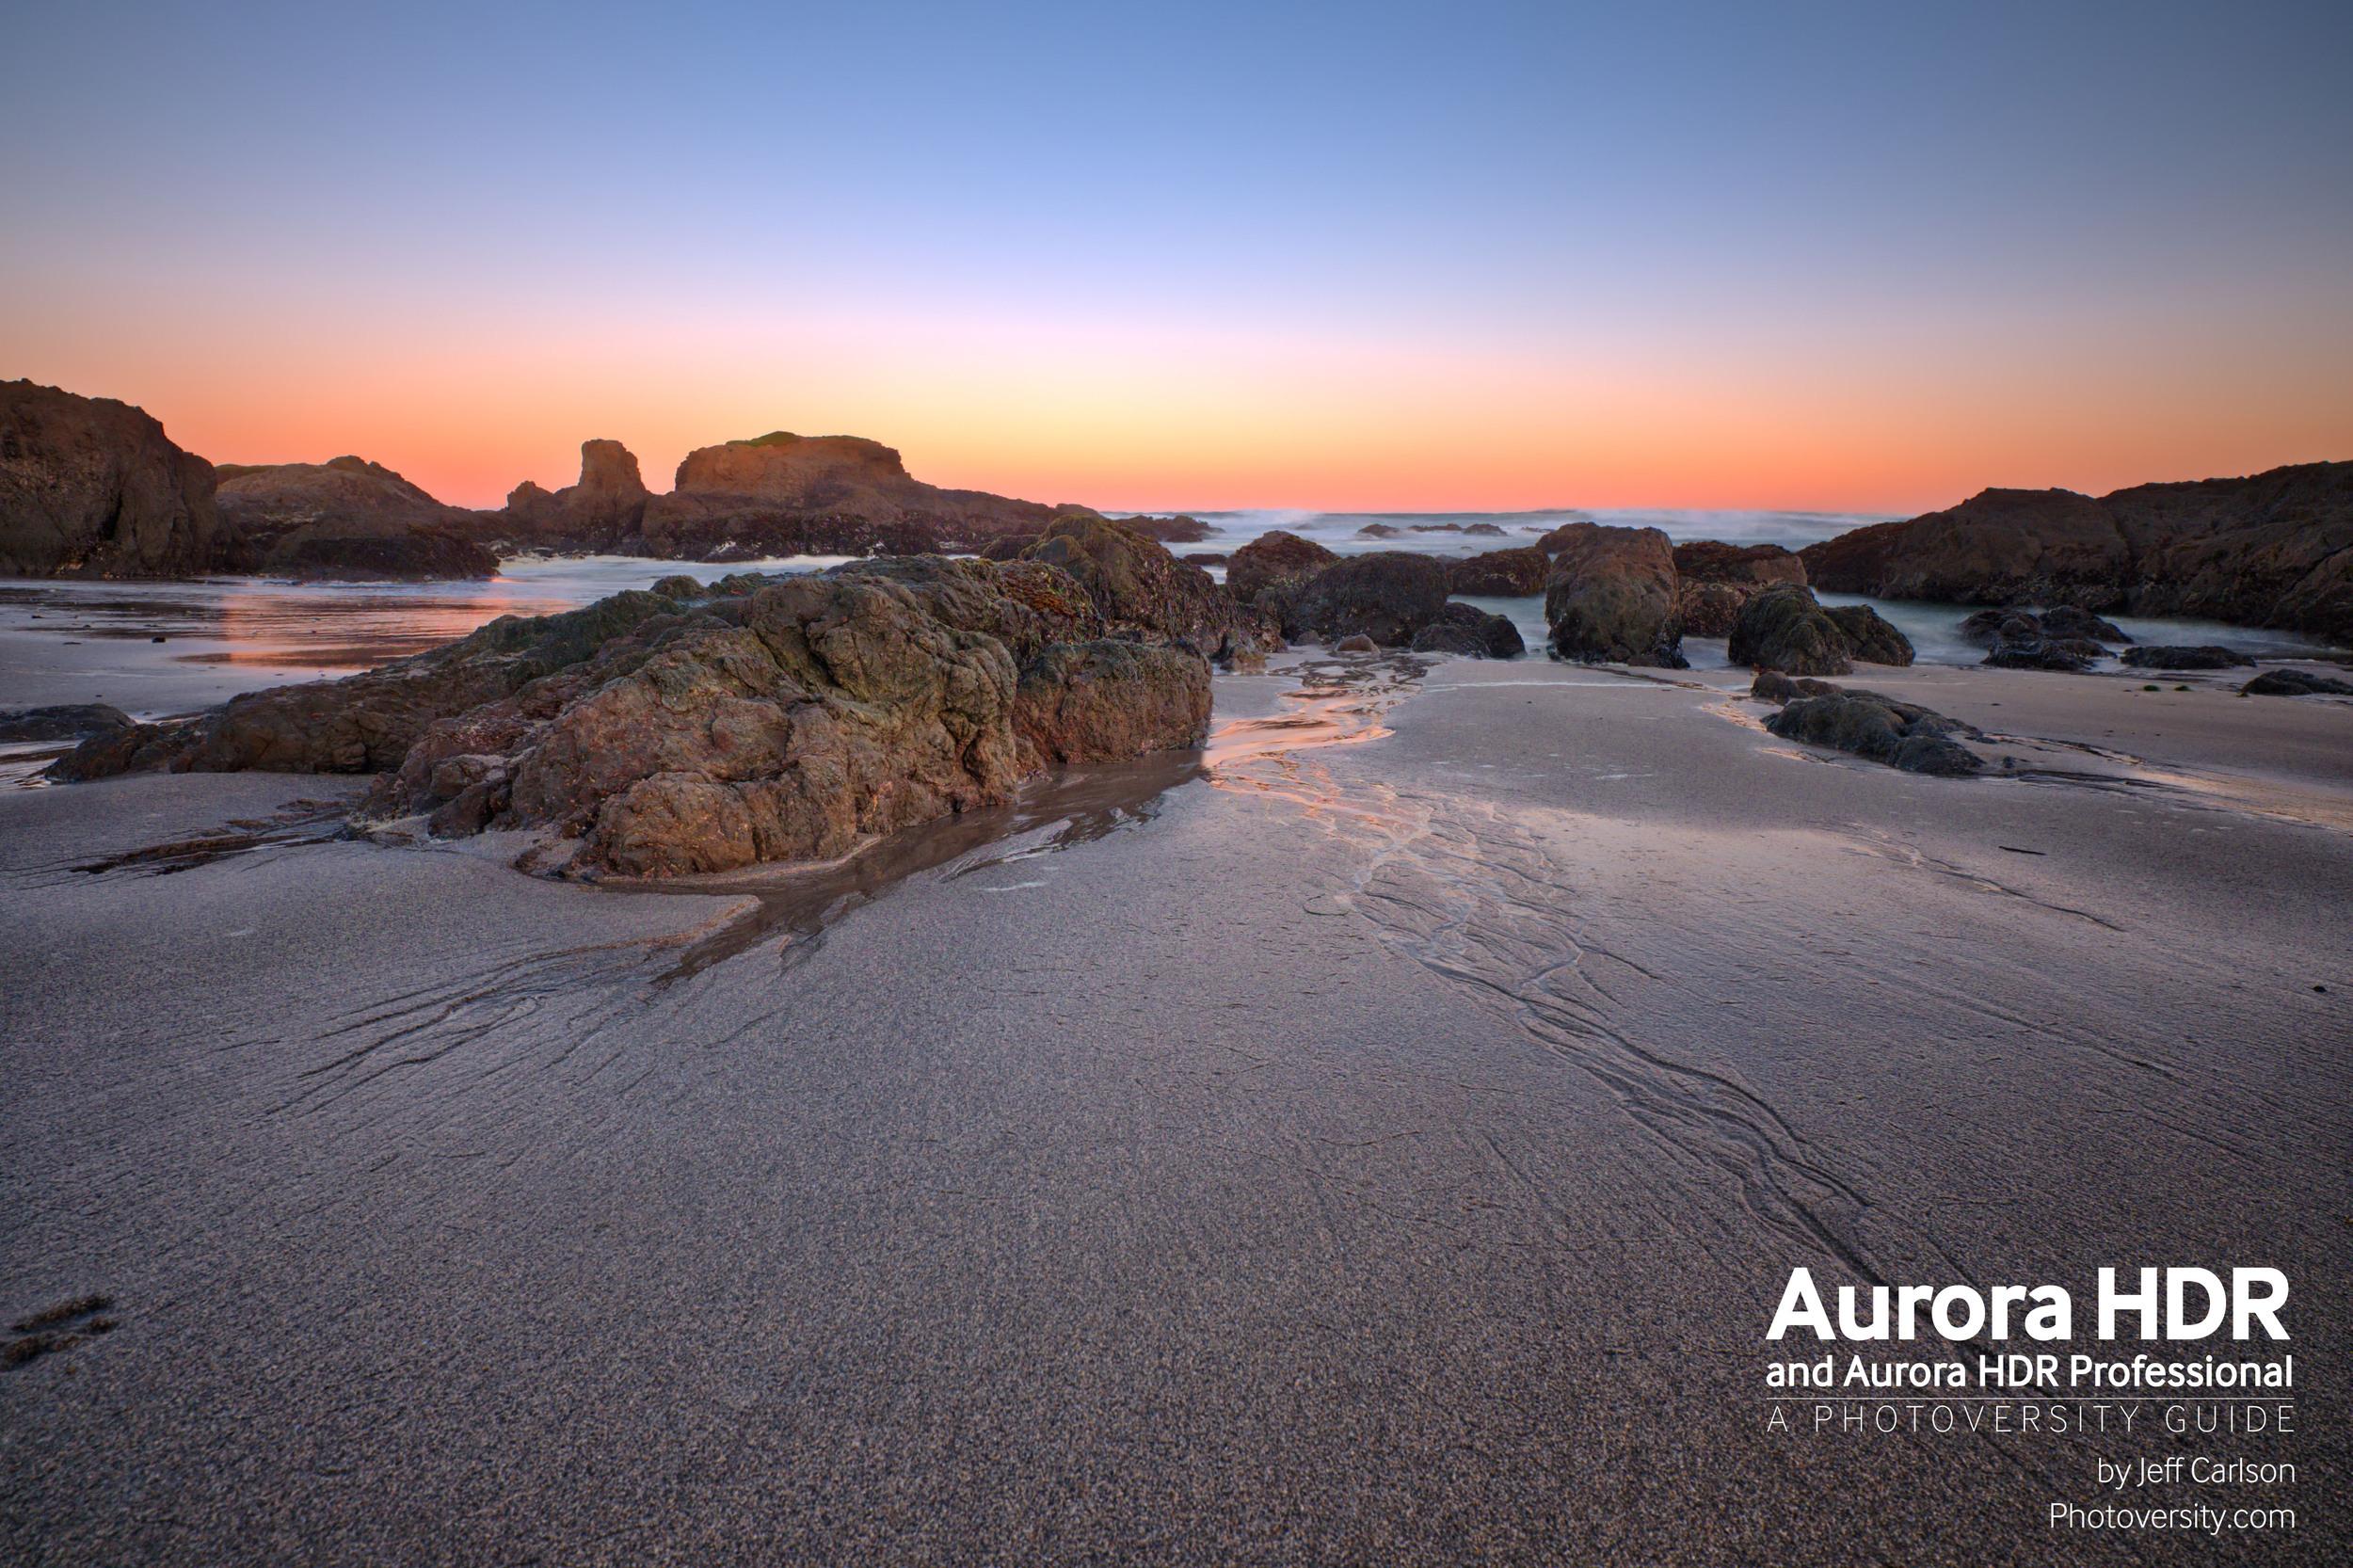 AuroraHDR_Guide_Rivulets_HDR.jpg